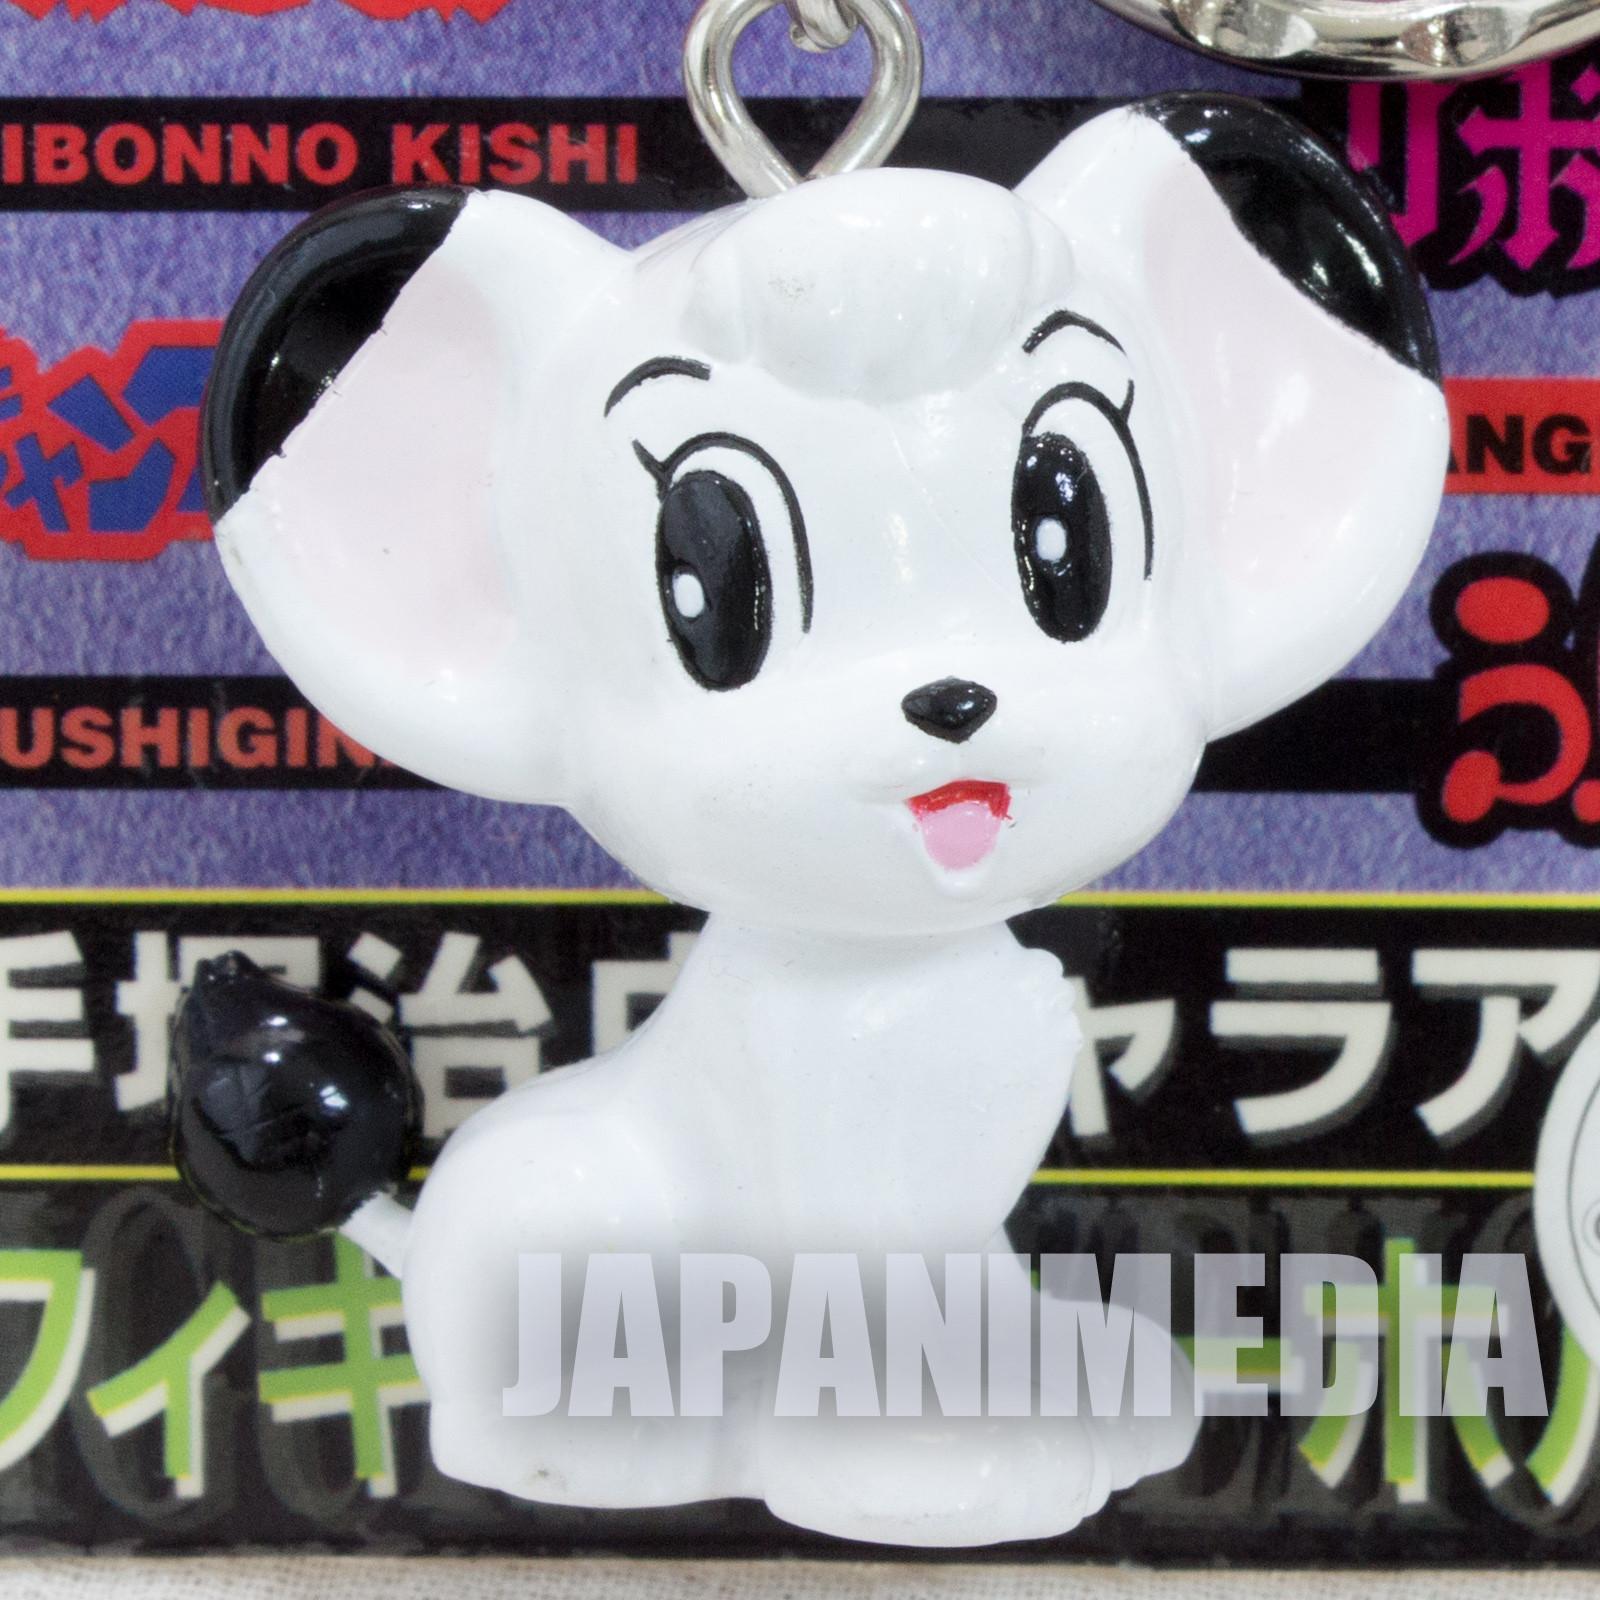 Jungle Emperor Leo Mascot Figure Key Chain Osamu Tezuka JAPAN ANIME MANGA